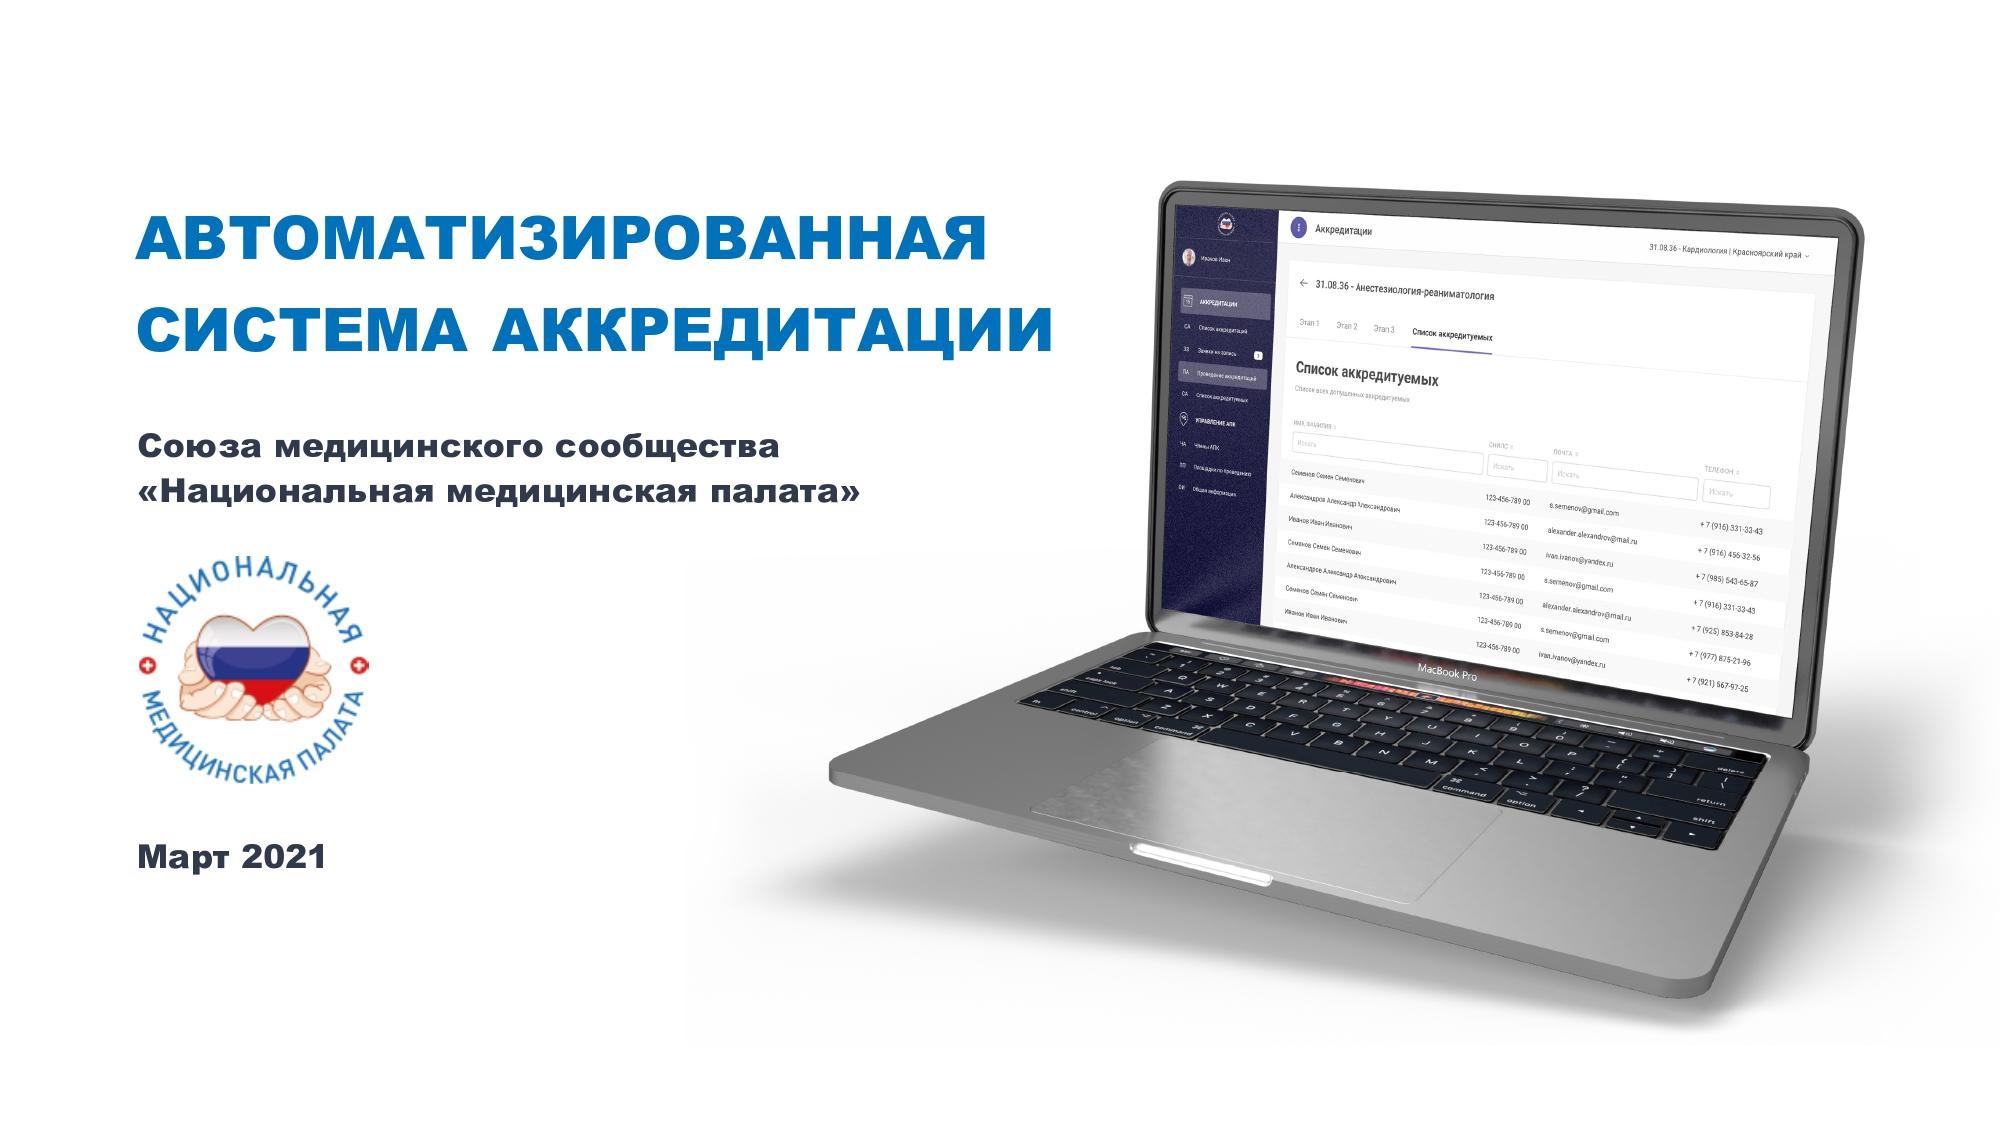 вебинар по обучению работе в АСА НМП